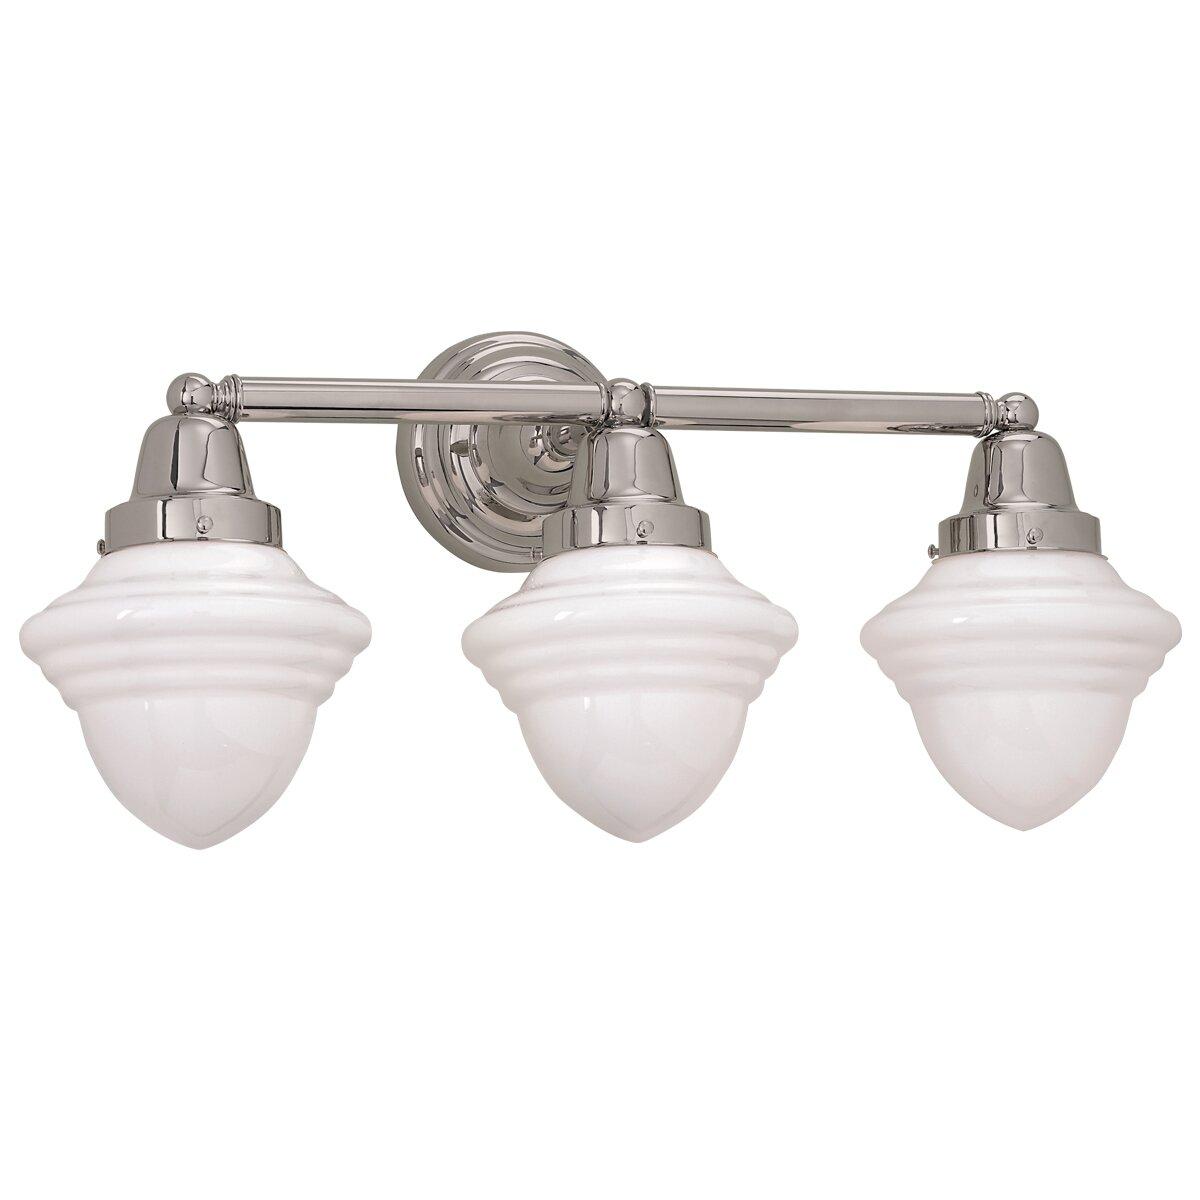 Norwell lighting bradford schoolhouse 3 light bath vanity light reviews wayfair for 3 light bathroom vanity light